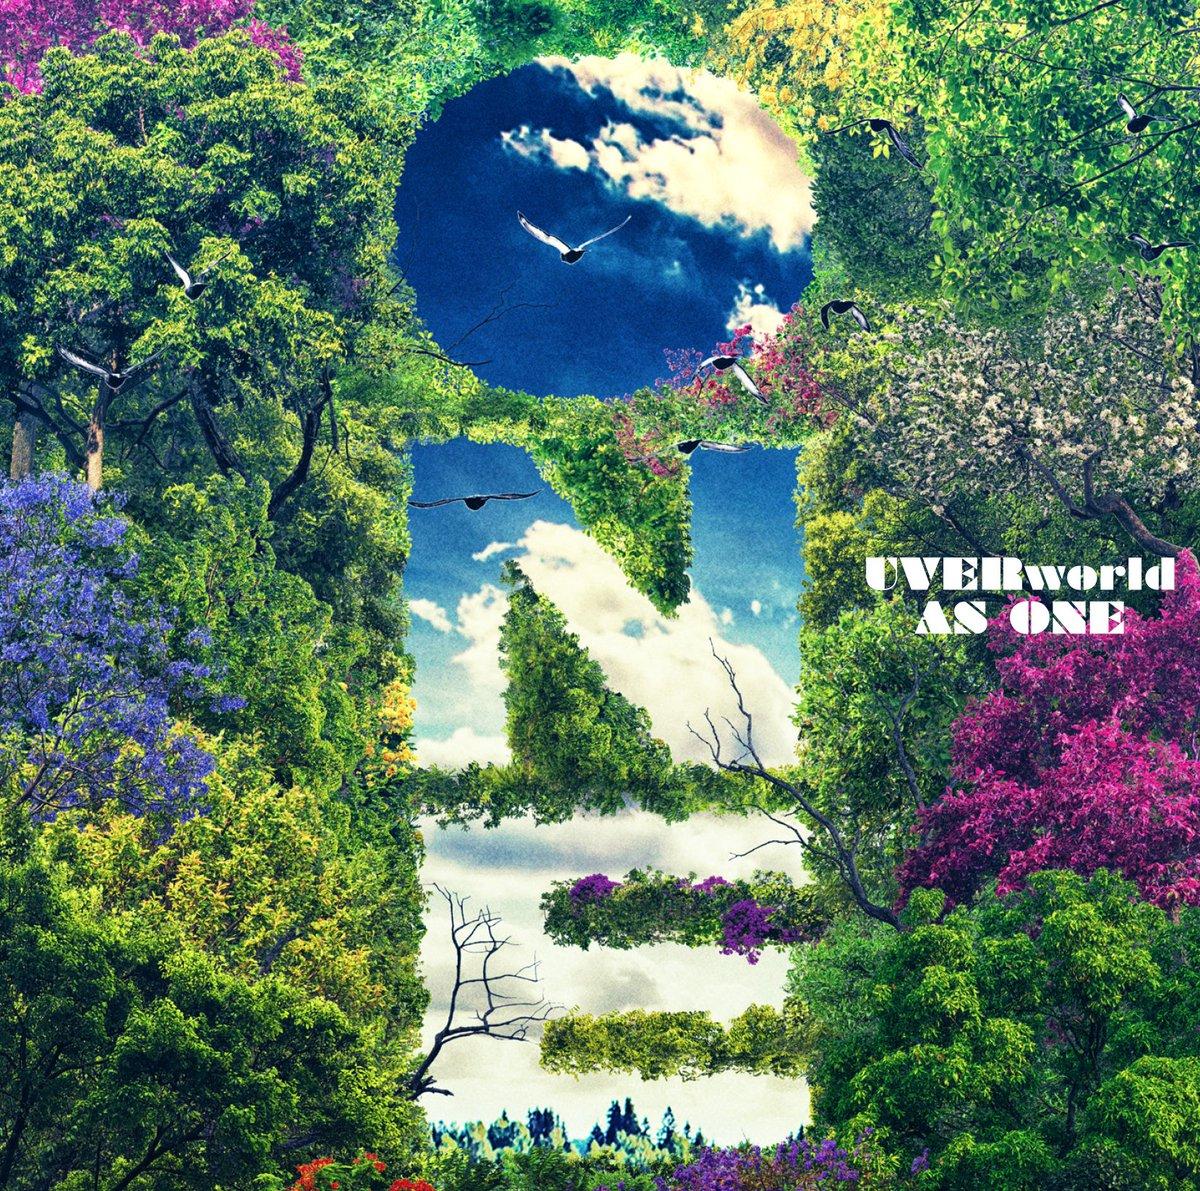 『UVERworld AS ONE 歌詞』収録の『AS ONE』ジャケット